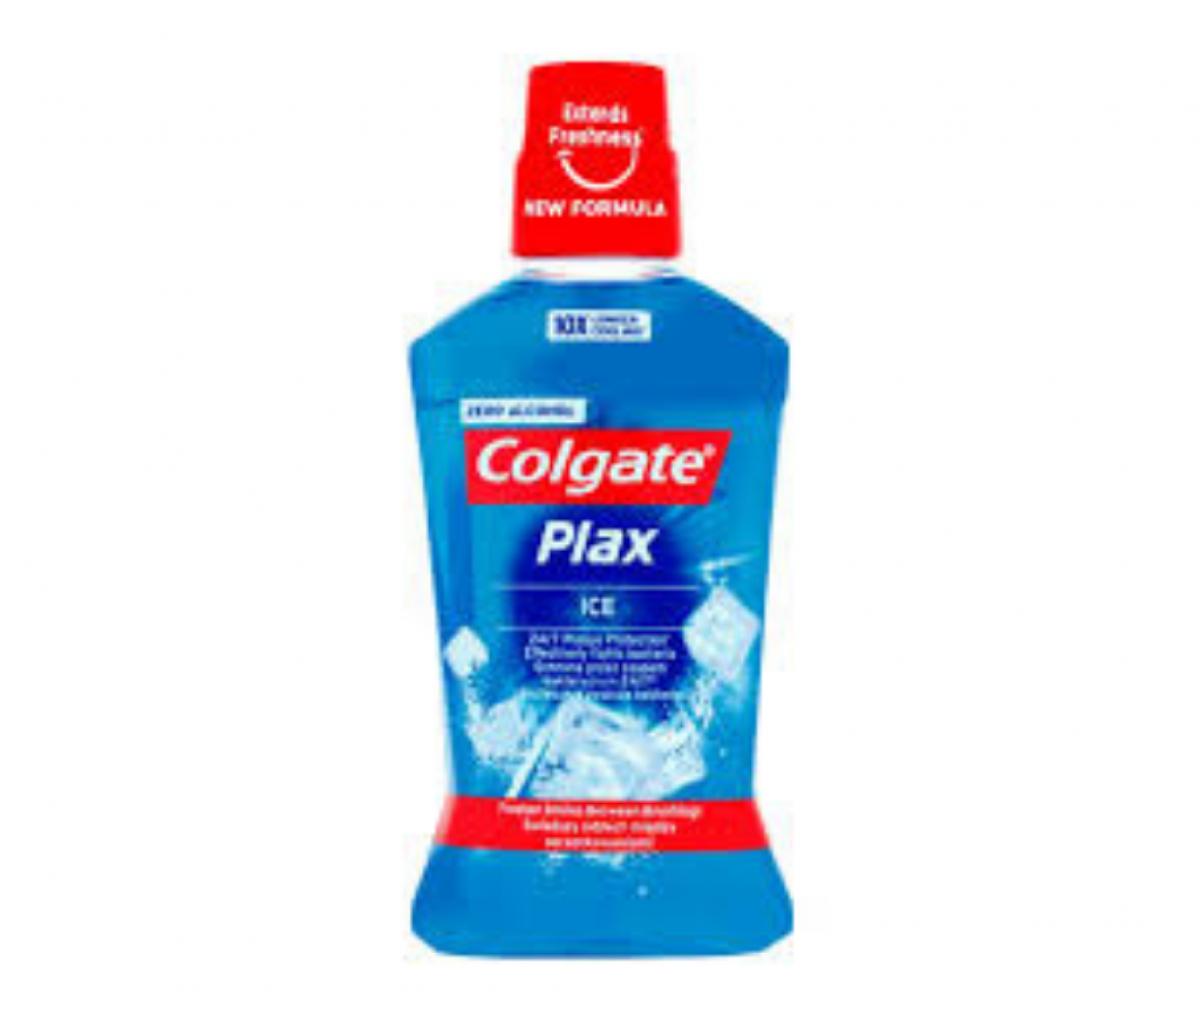 Colgate 500ml Plax Ice Mouthwash